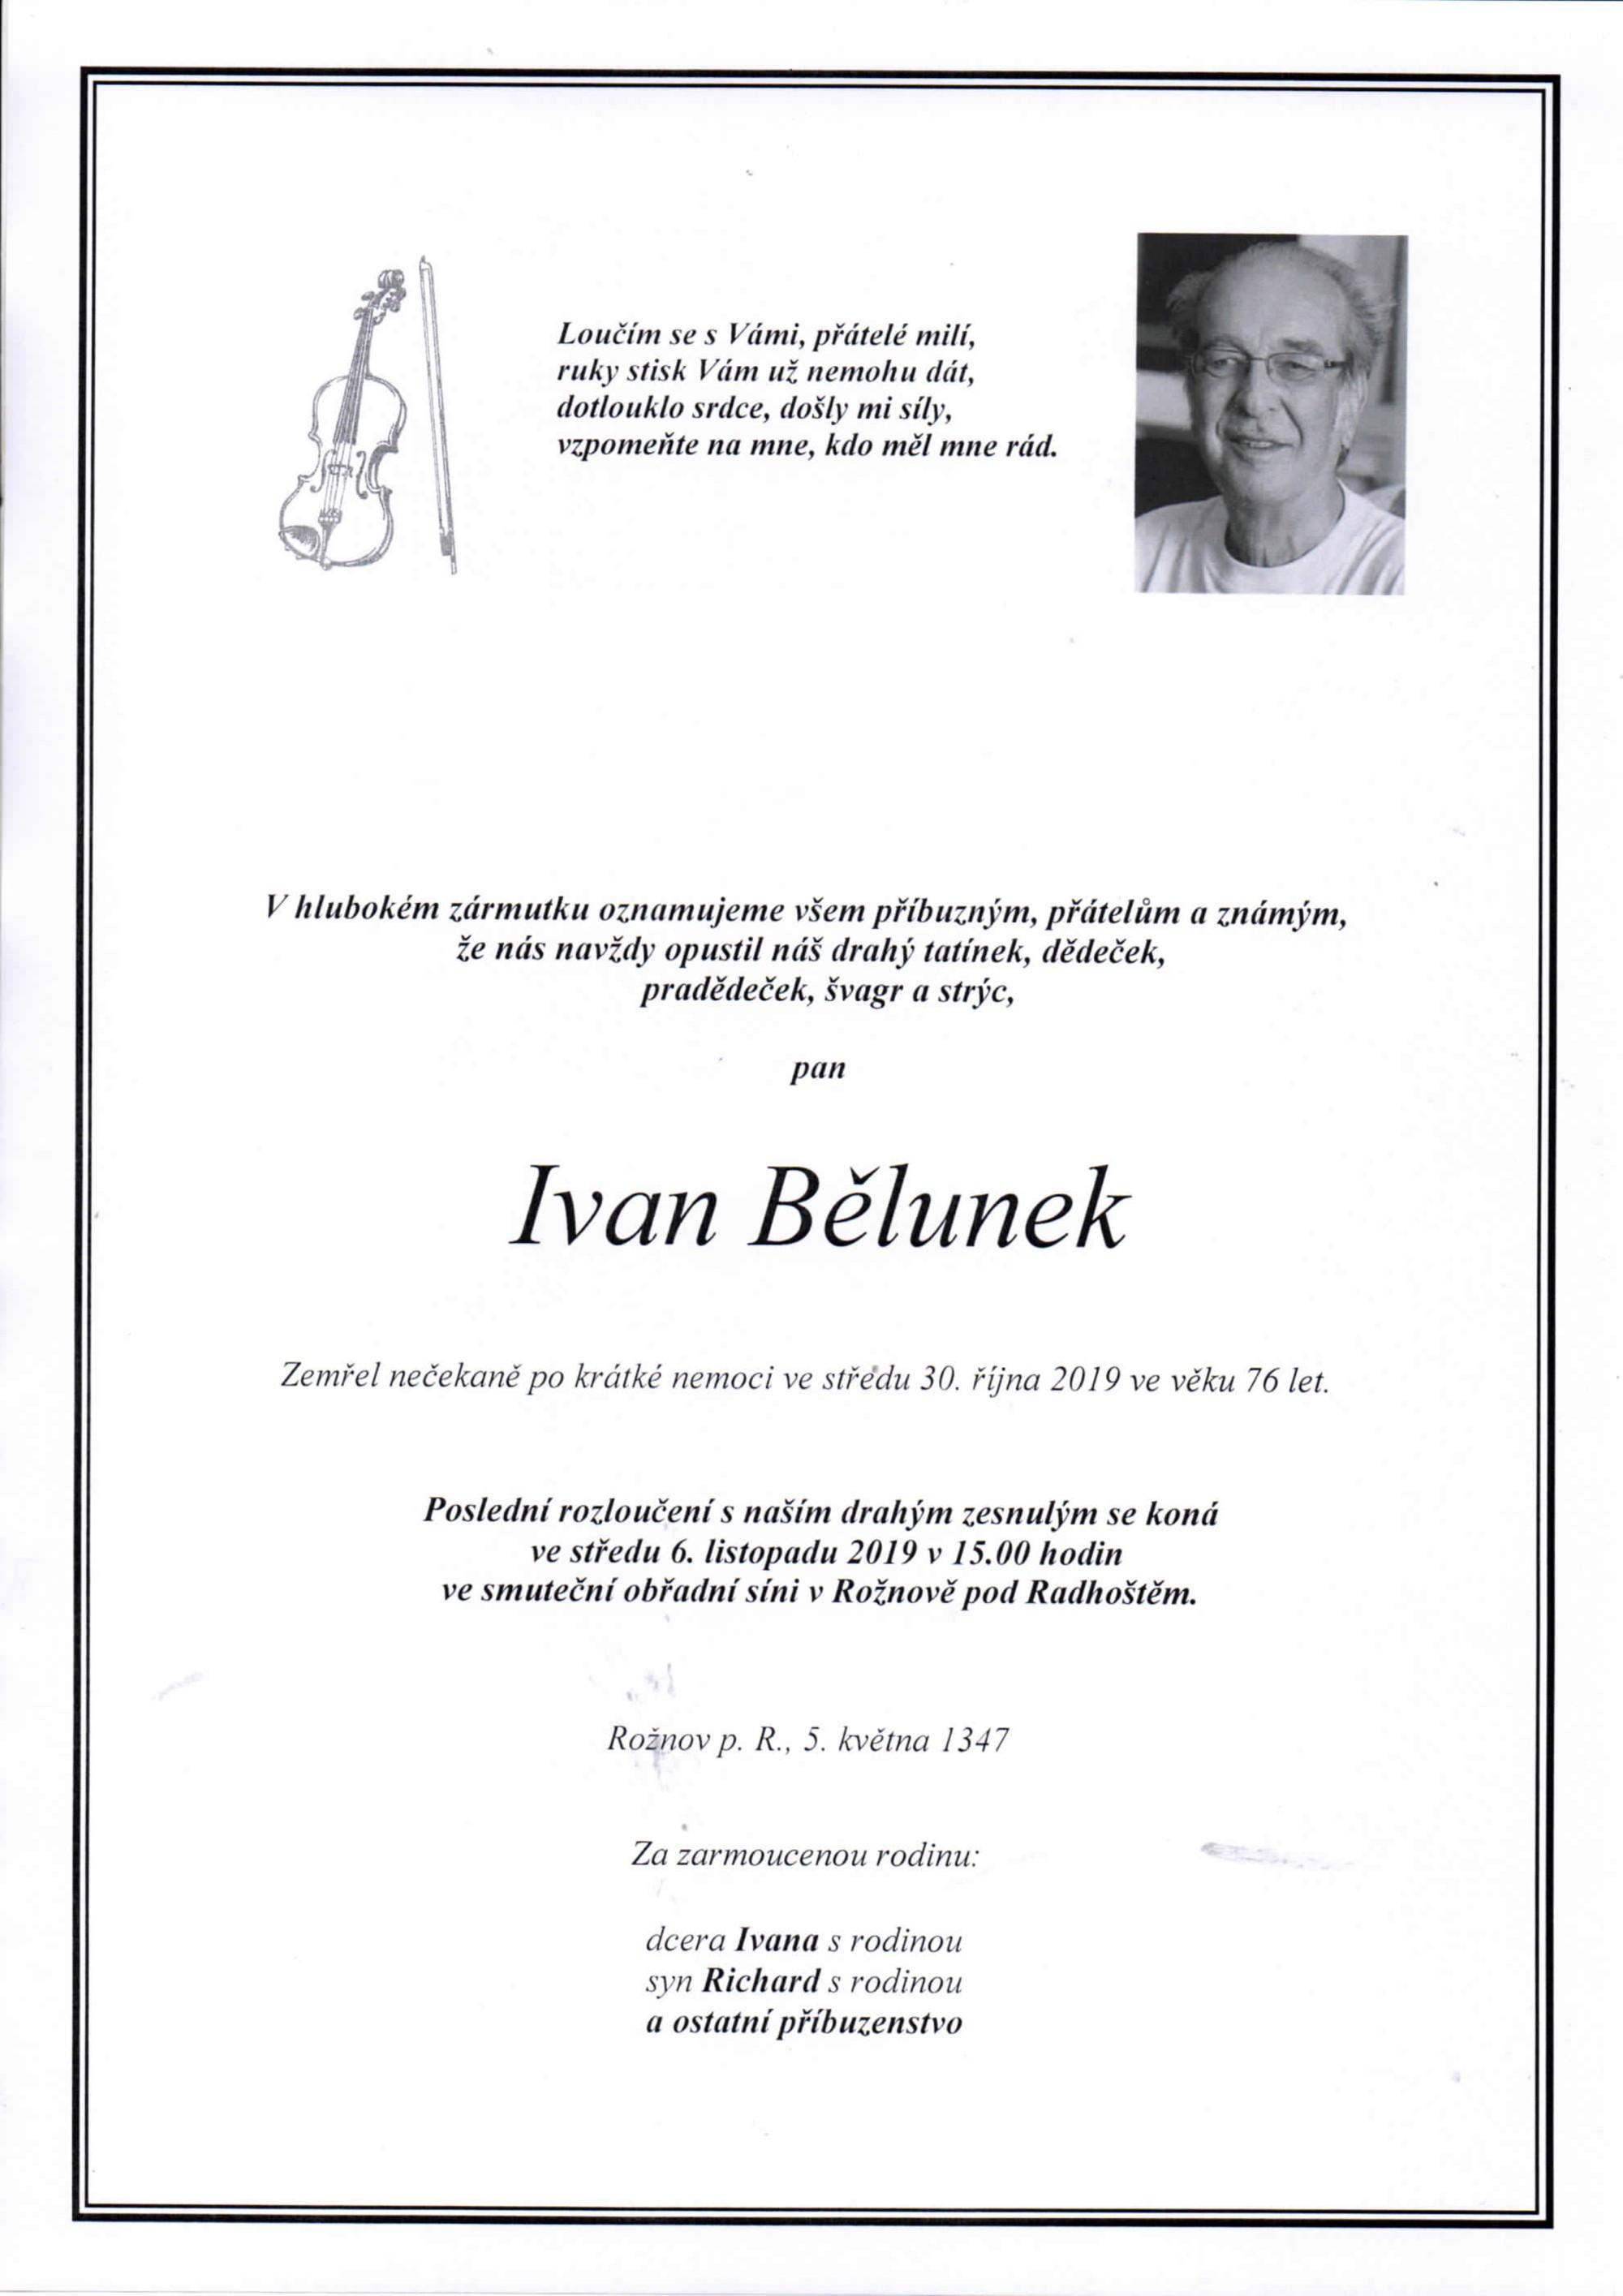 Ivan Bělunek